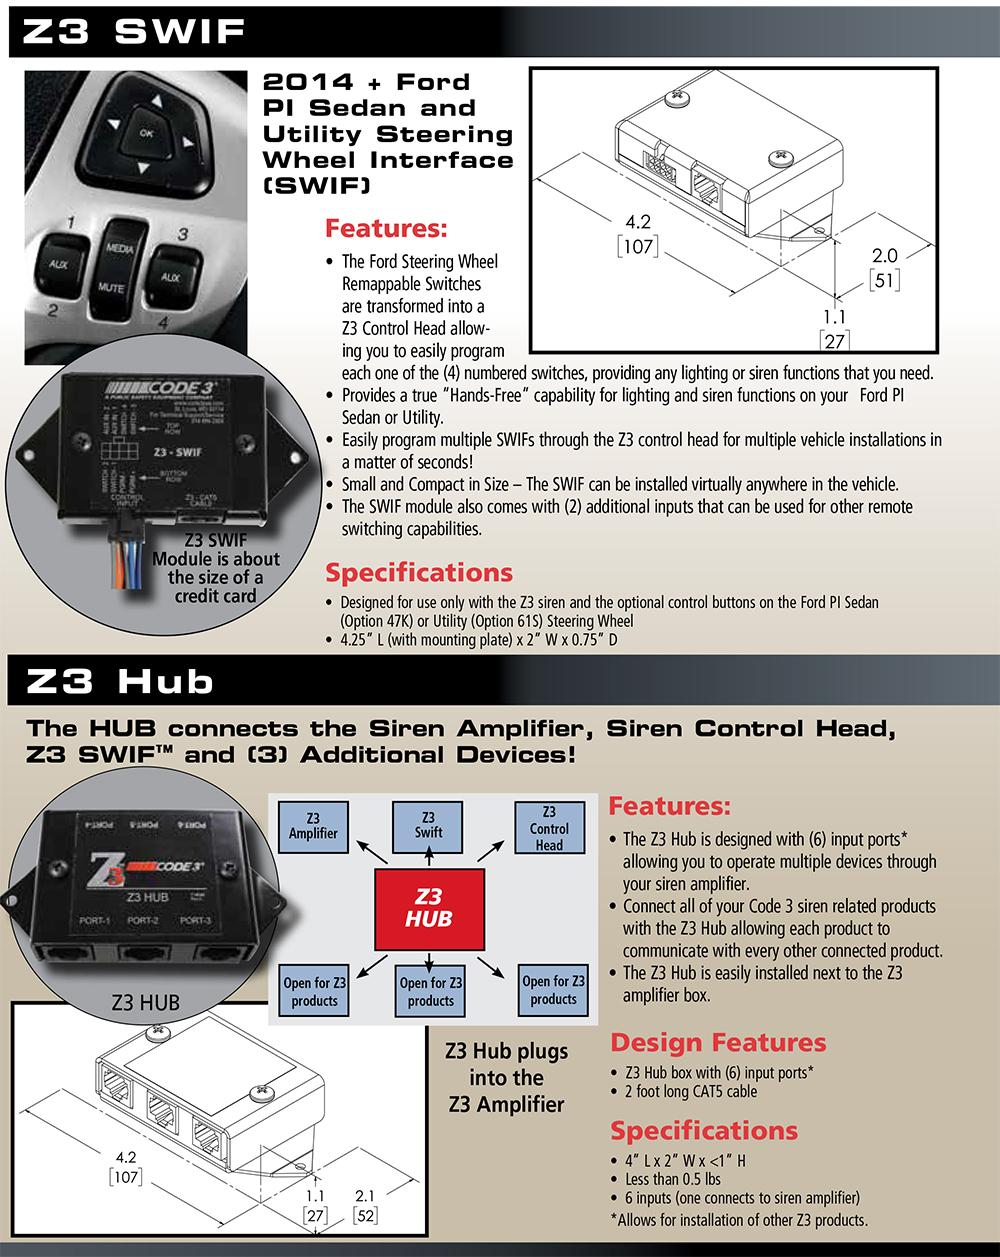 swif-and-hub-info.jpg